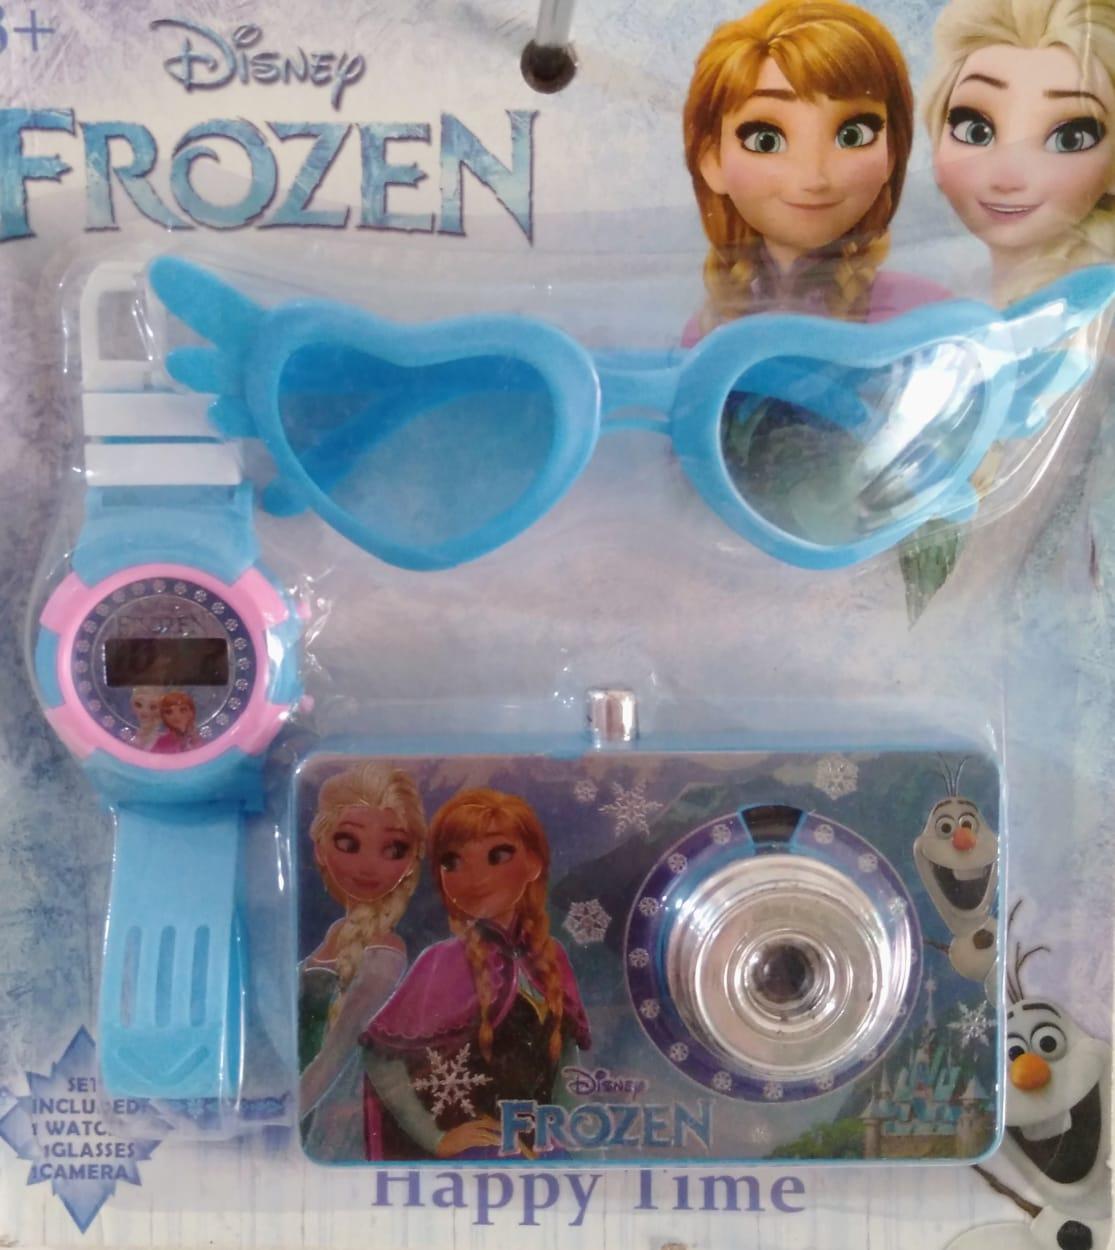 Disney Frozen Accessories